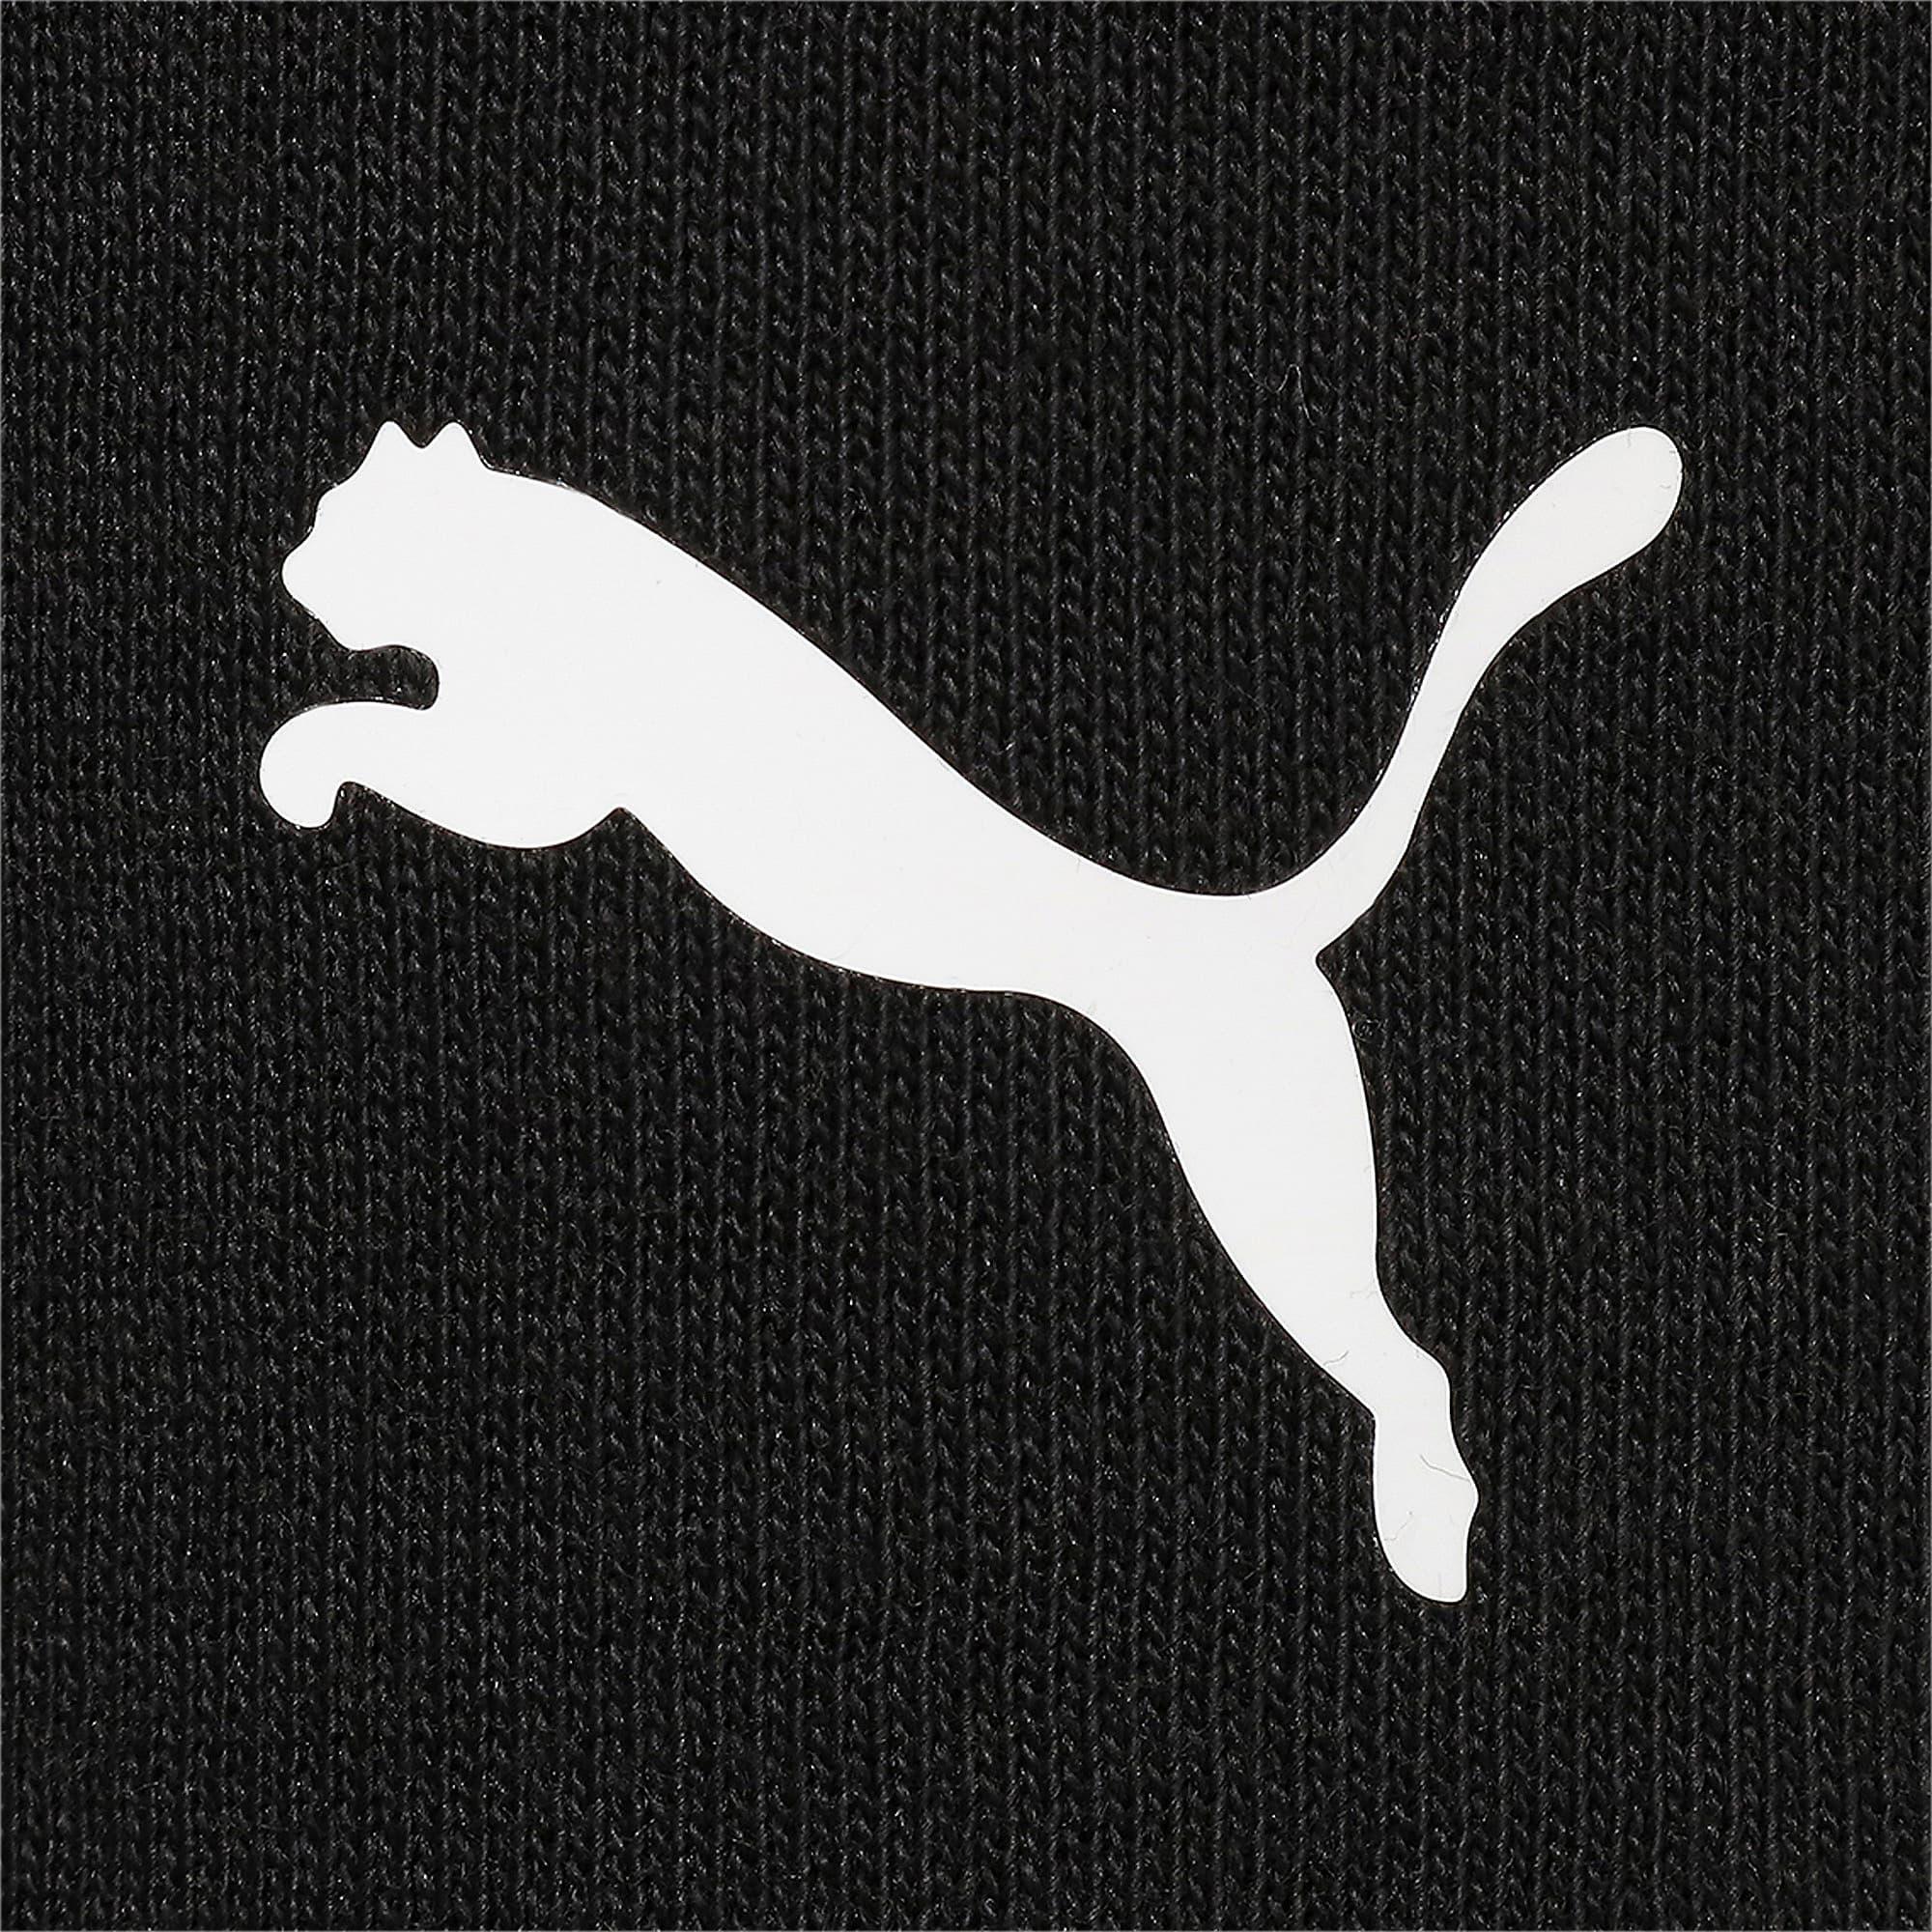 Thumbnail 7 of フィール イット ウィメンズ スウェットパンツ, Puma Black, medium-JPN